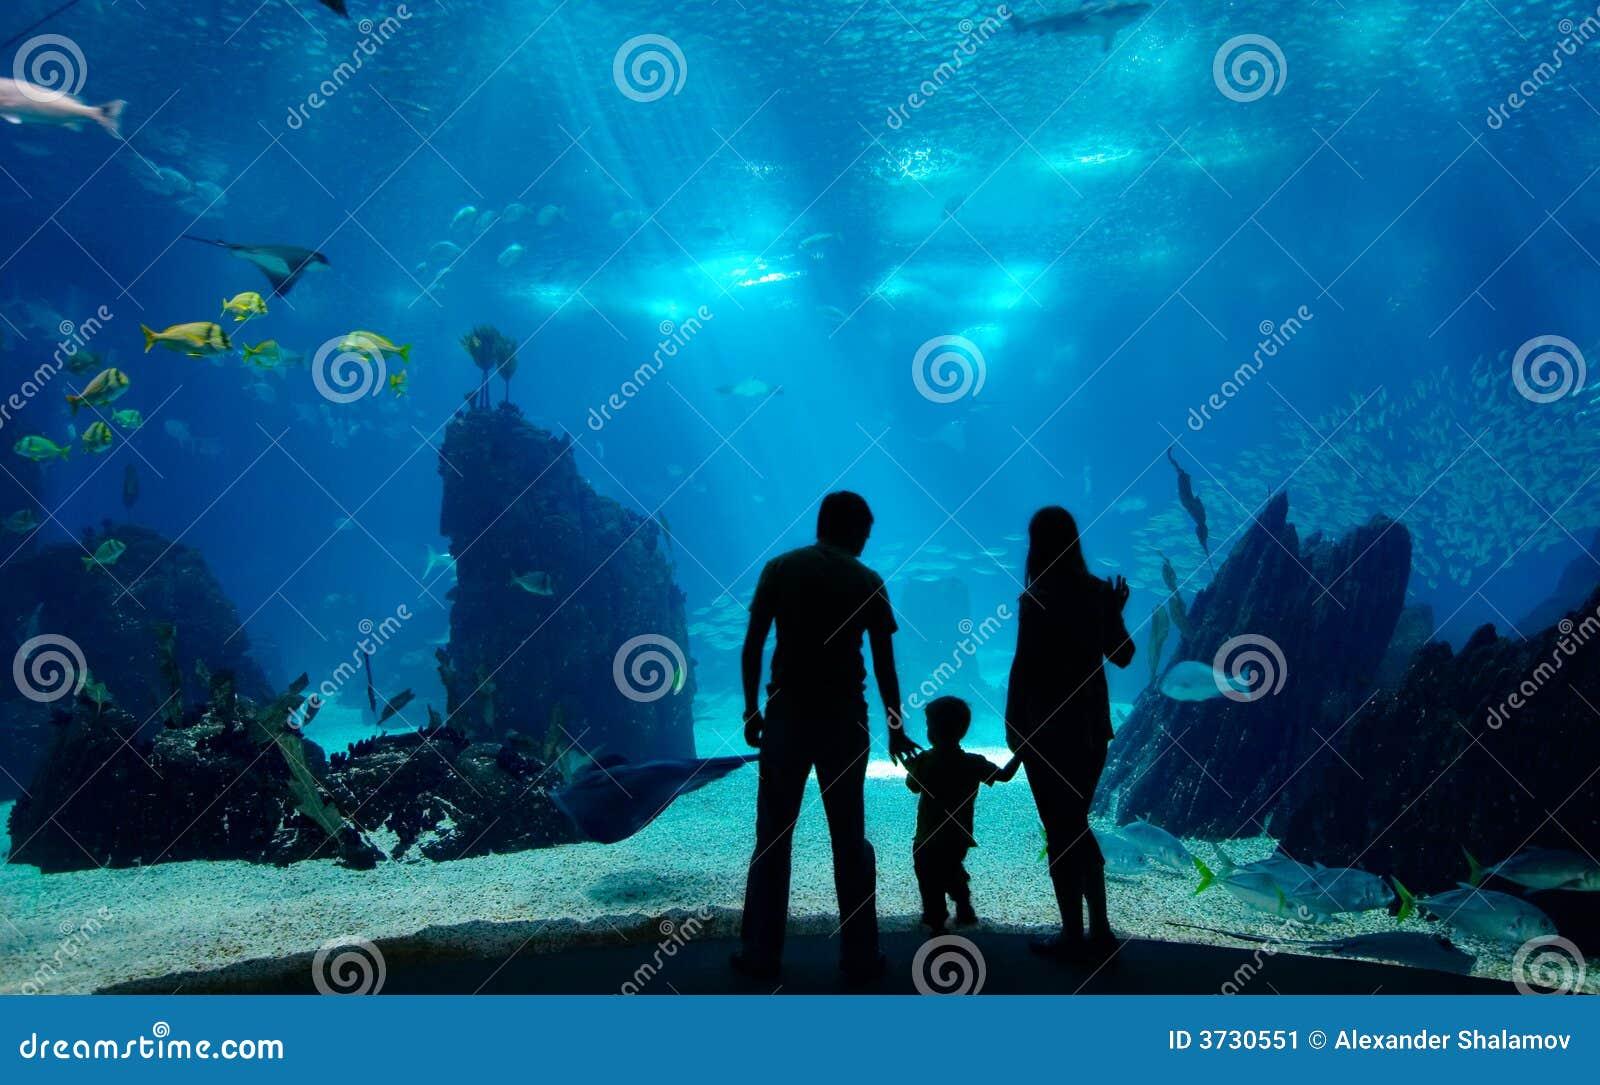 Underwater family